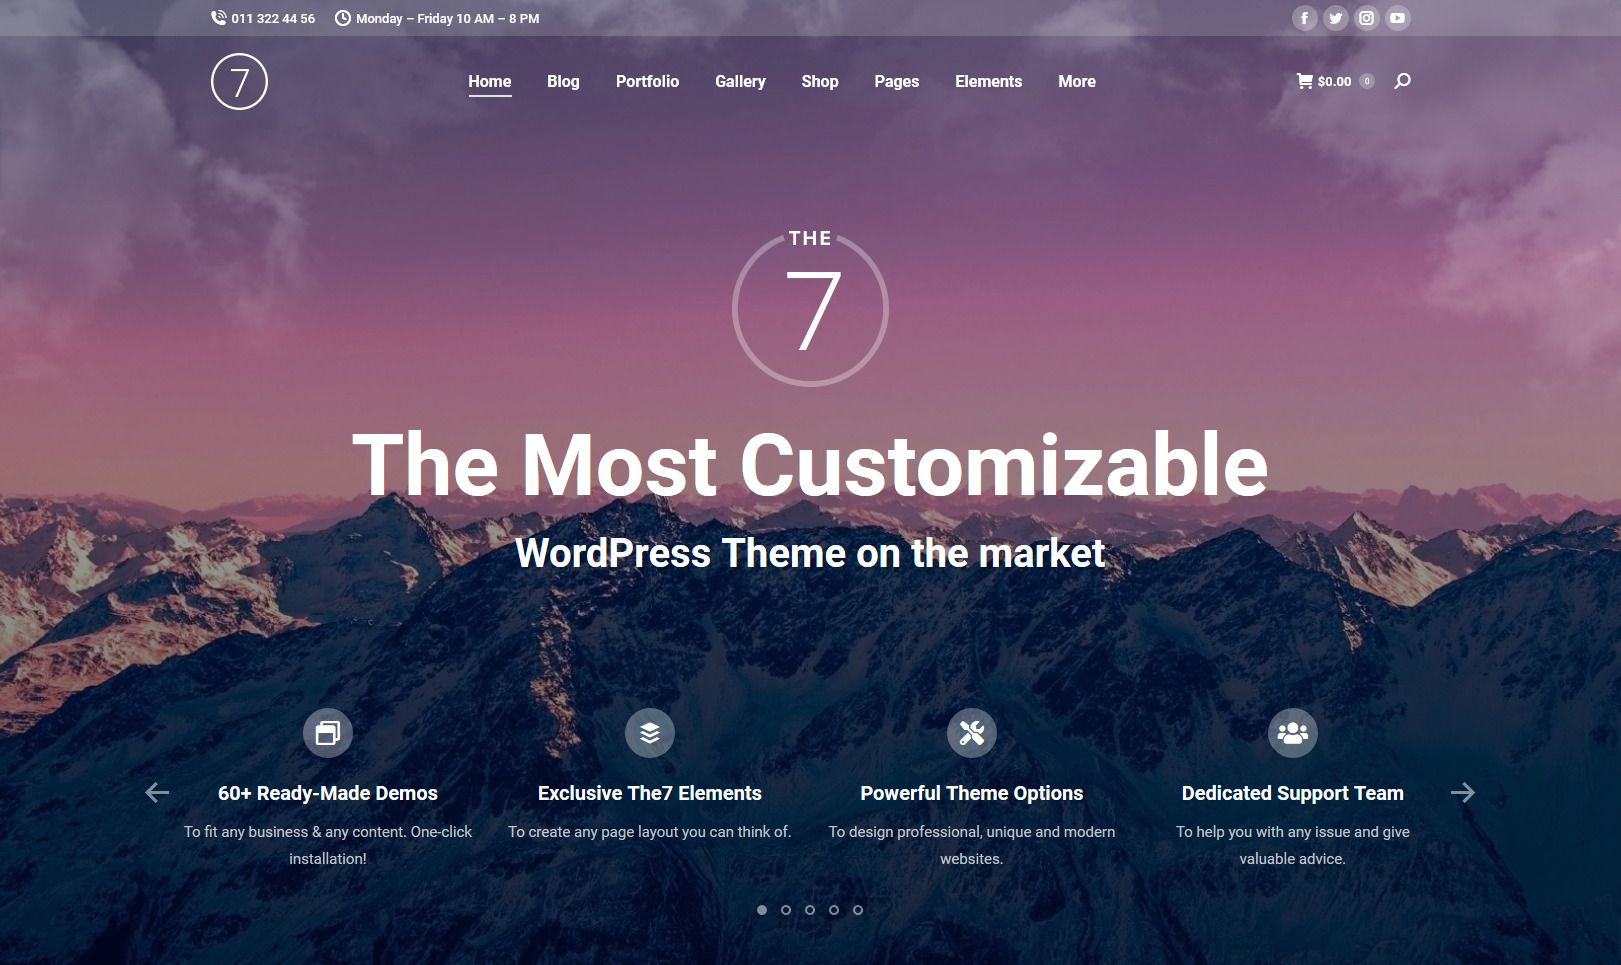 The 7 The Customizable Theme